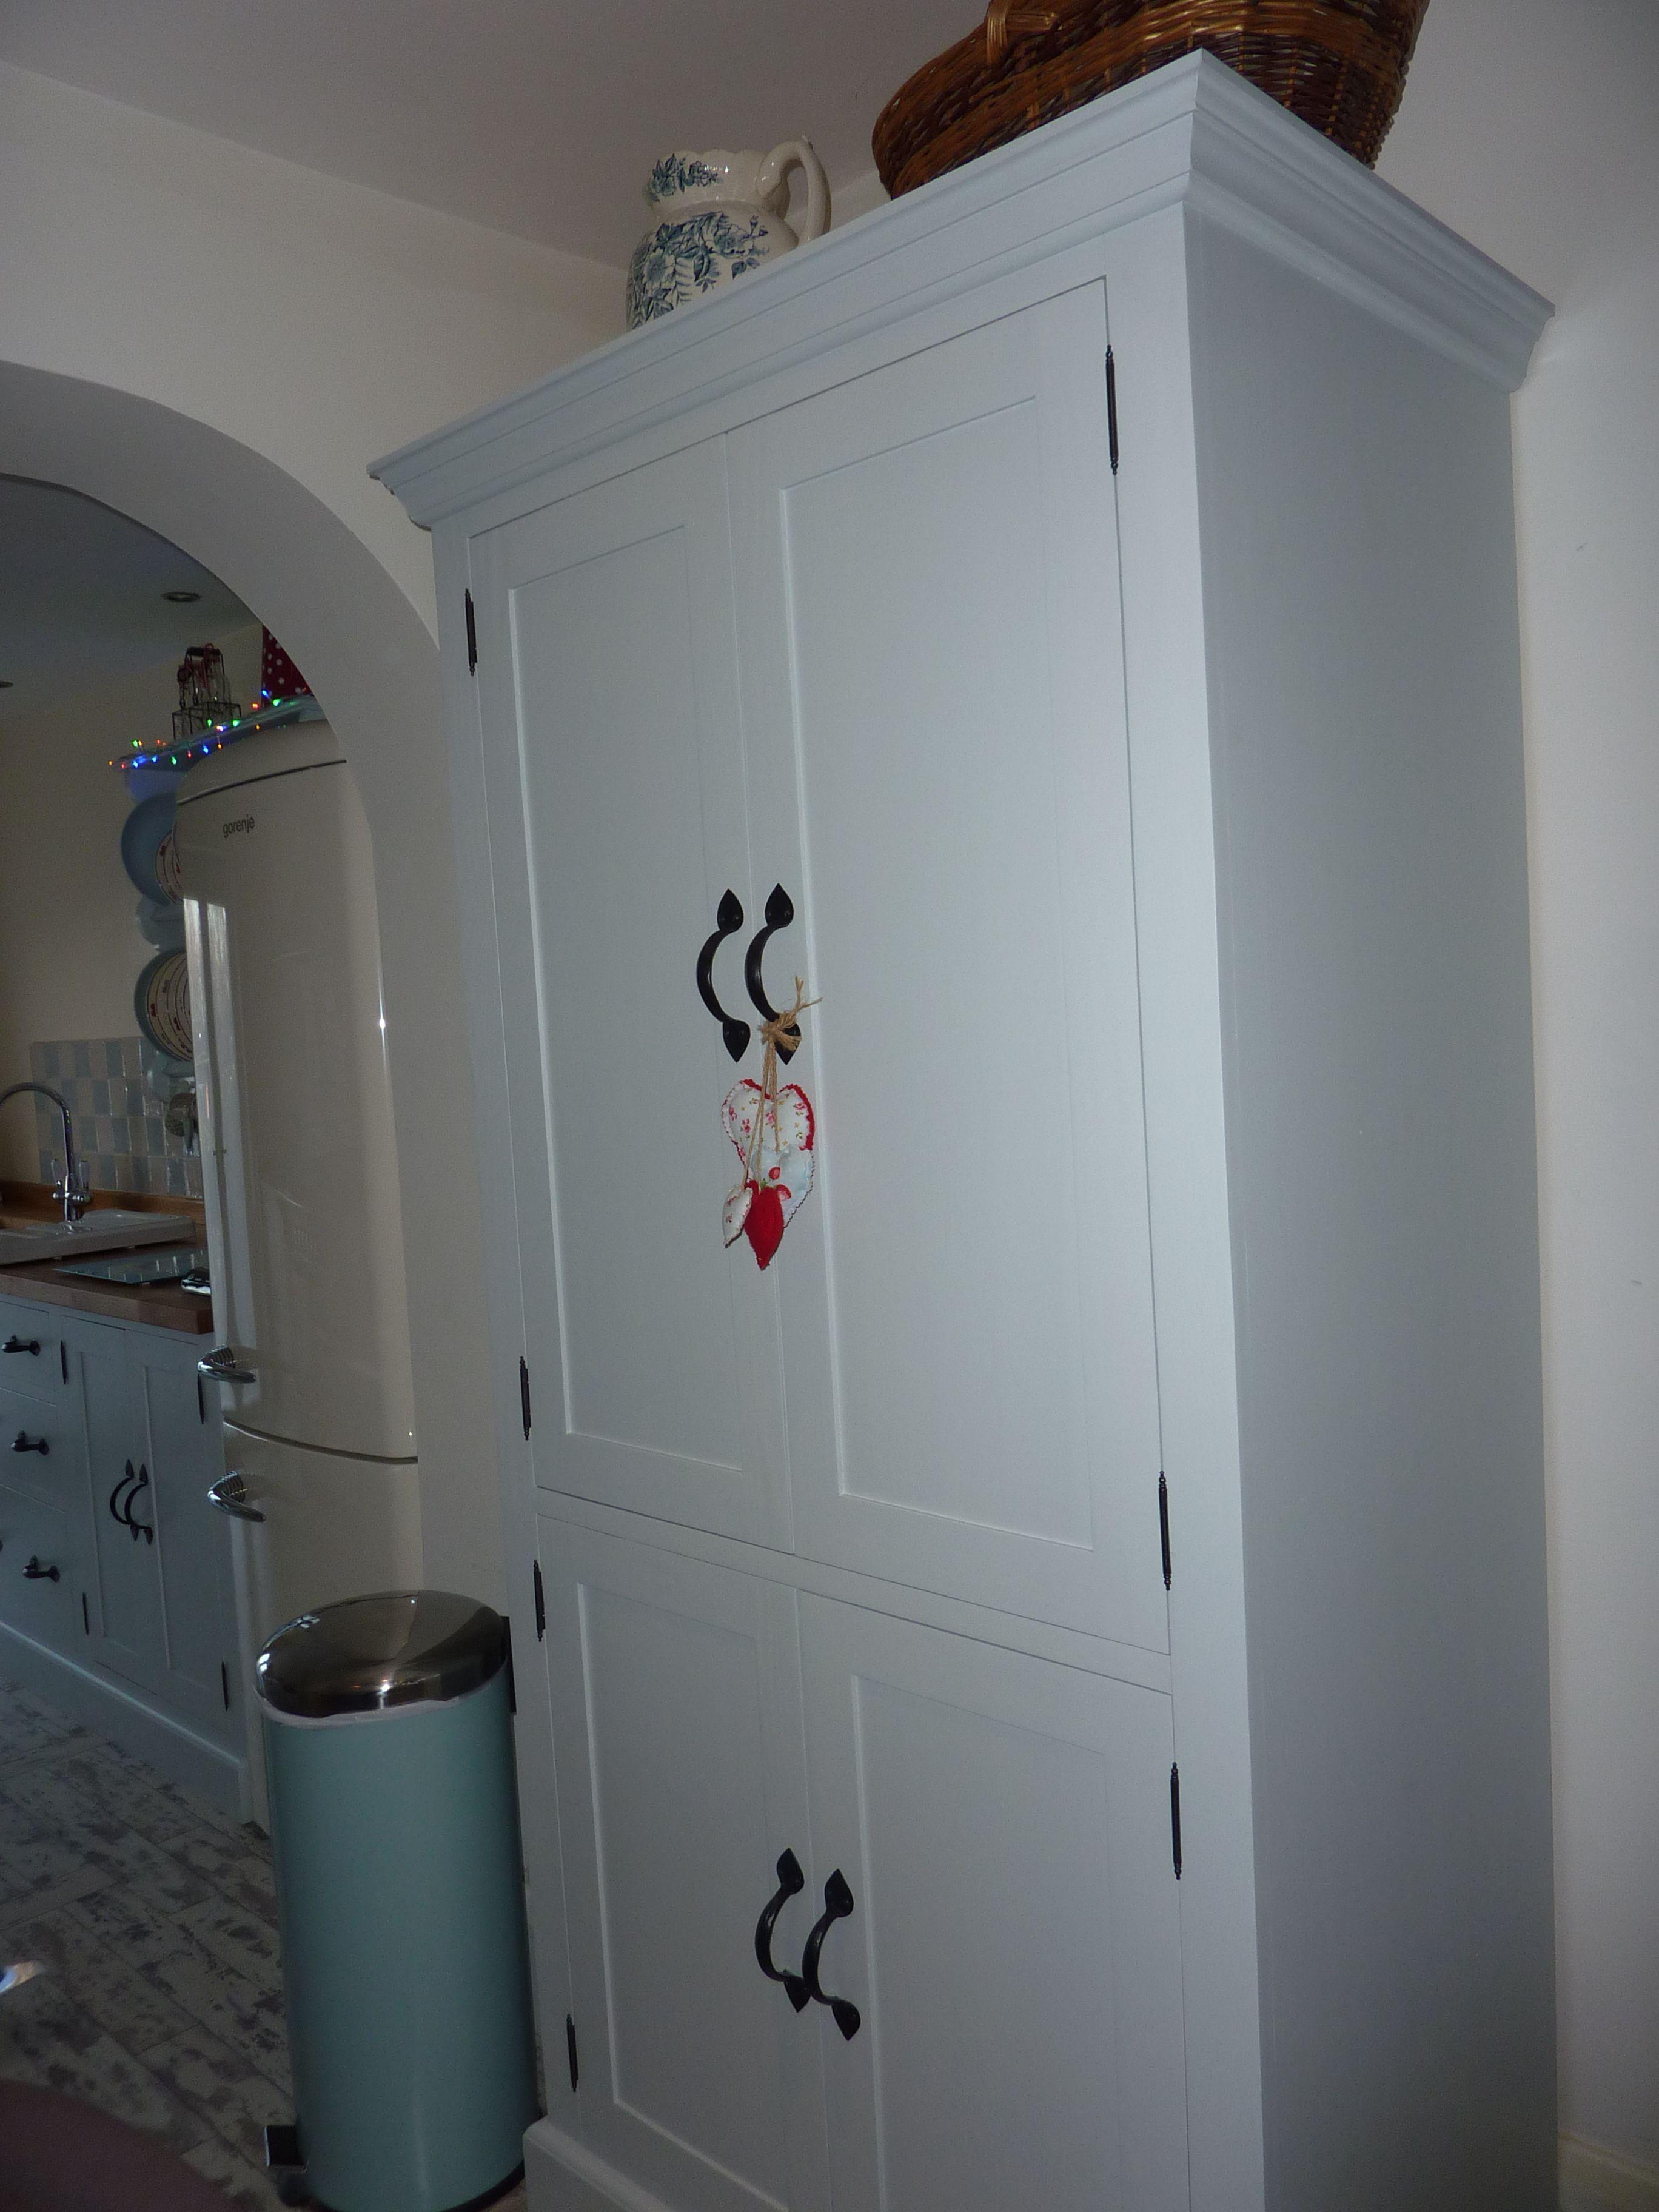 Shabby chic cottage kitchen in farrow & ball borrowed light | Shabby ...